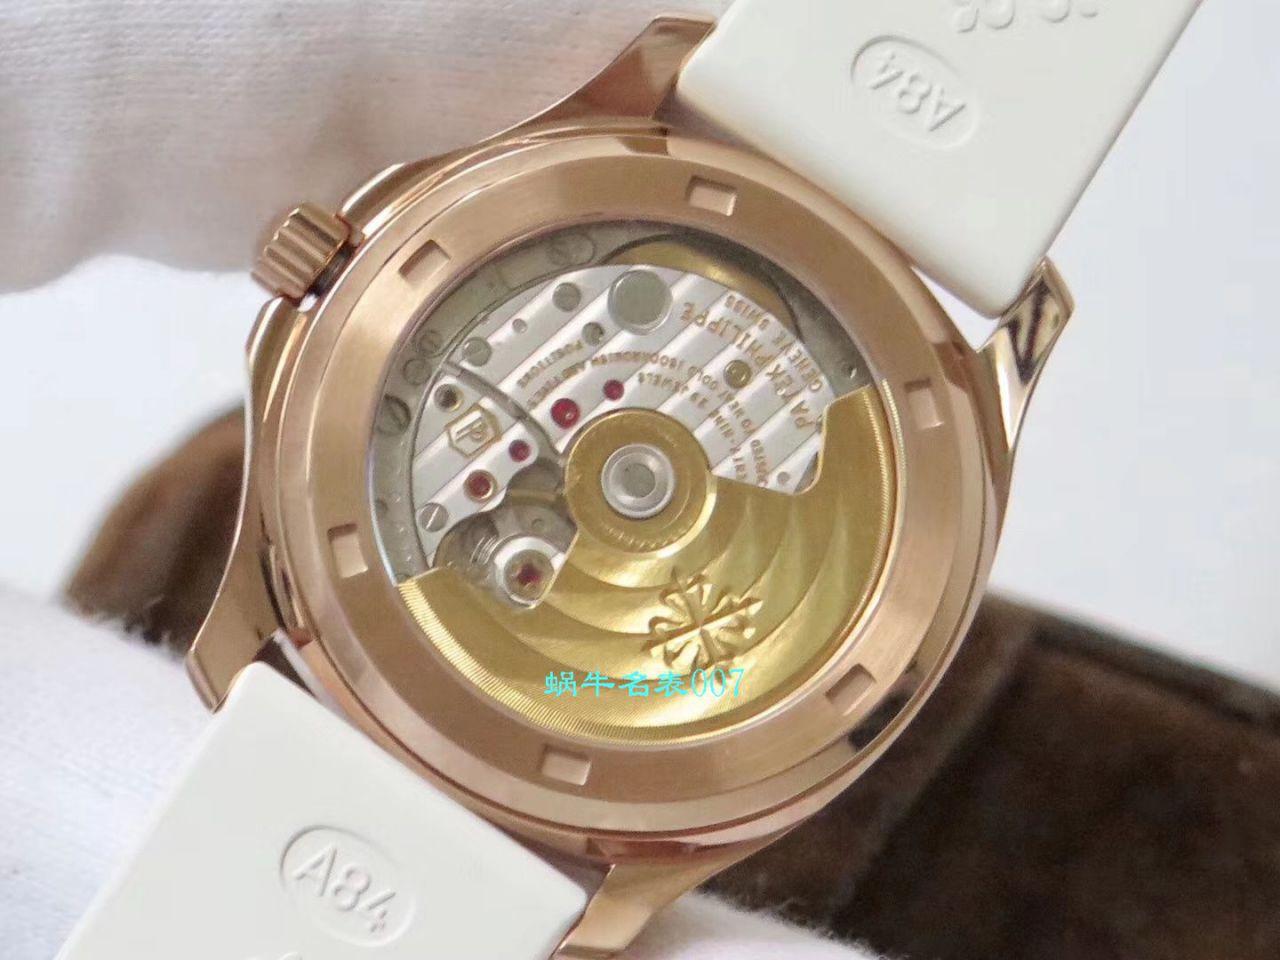 【PPF厂百达翡丽复刻女表】百达翡丽AQUANAUT系列5069R-001腕表 / BD229